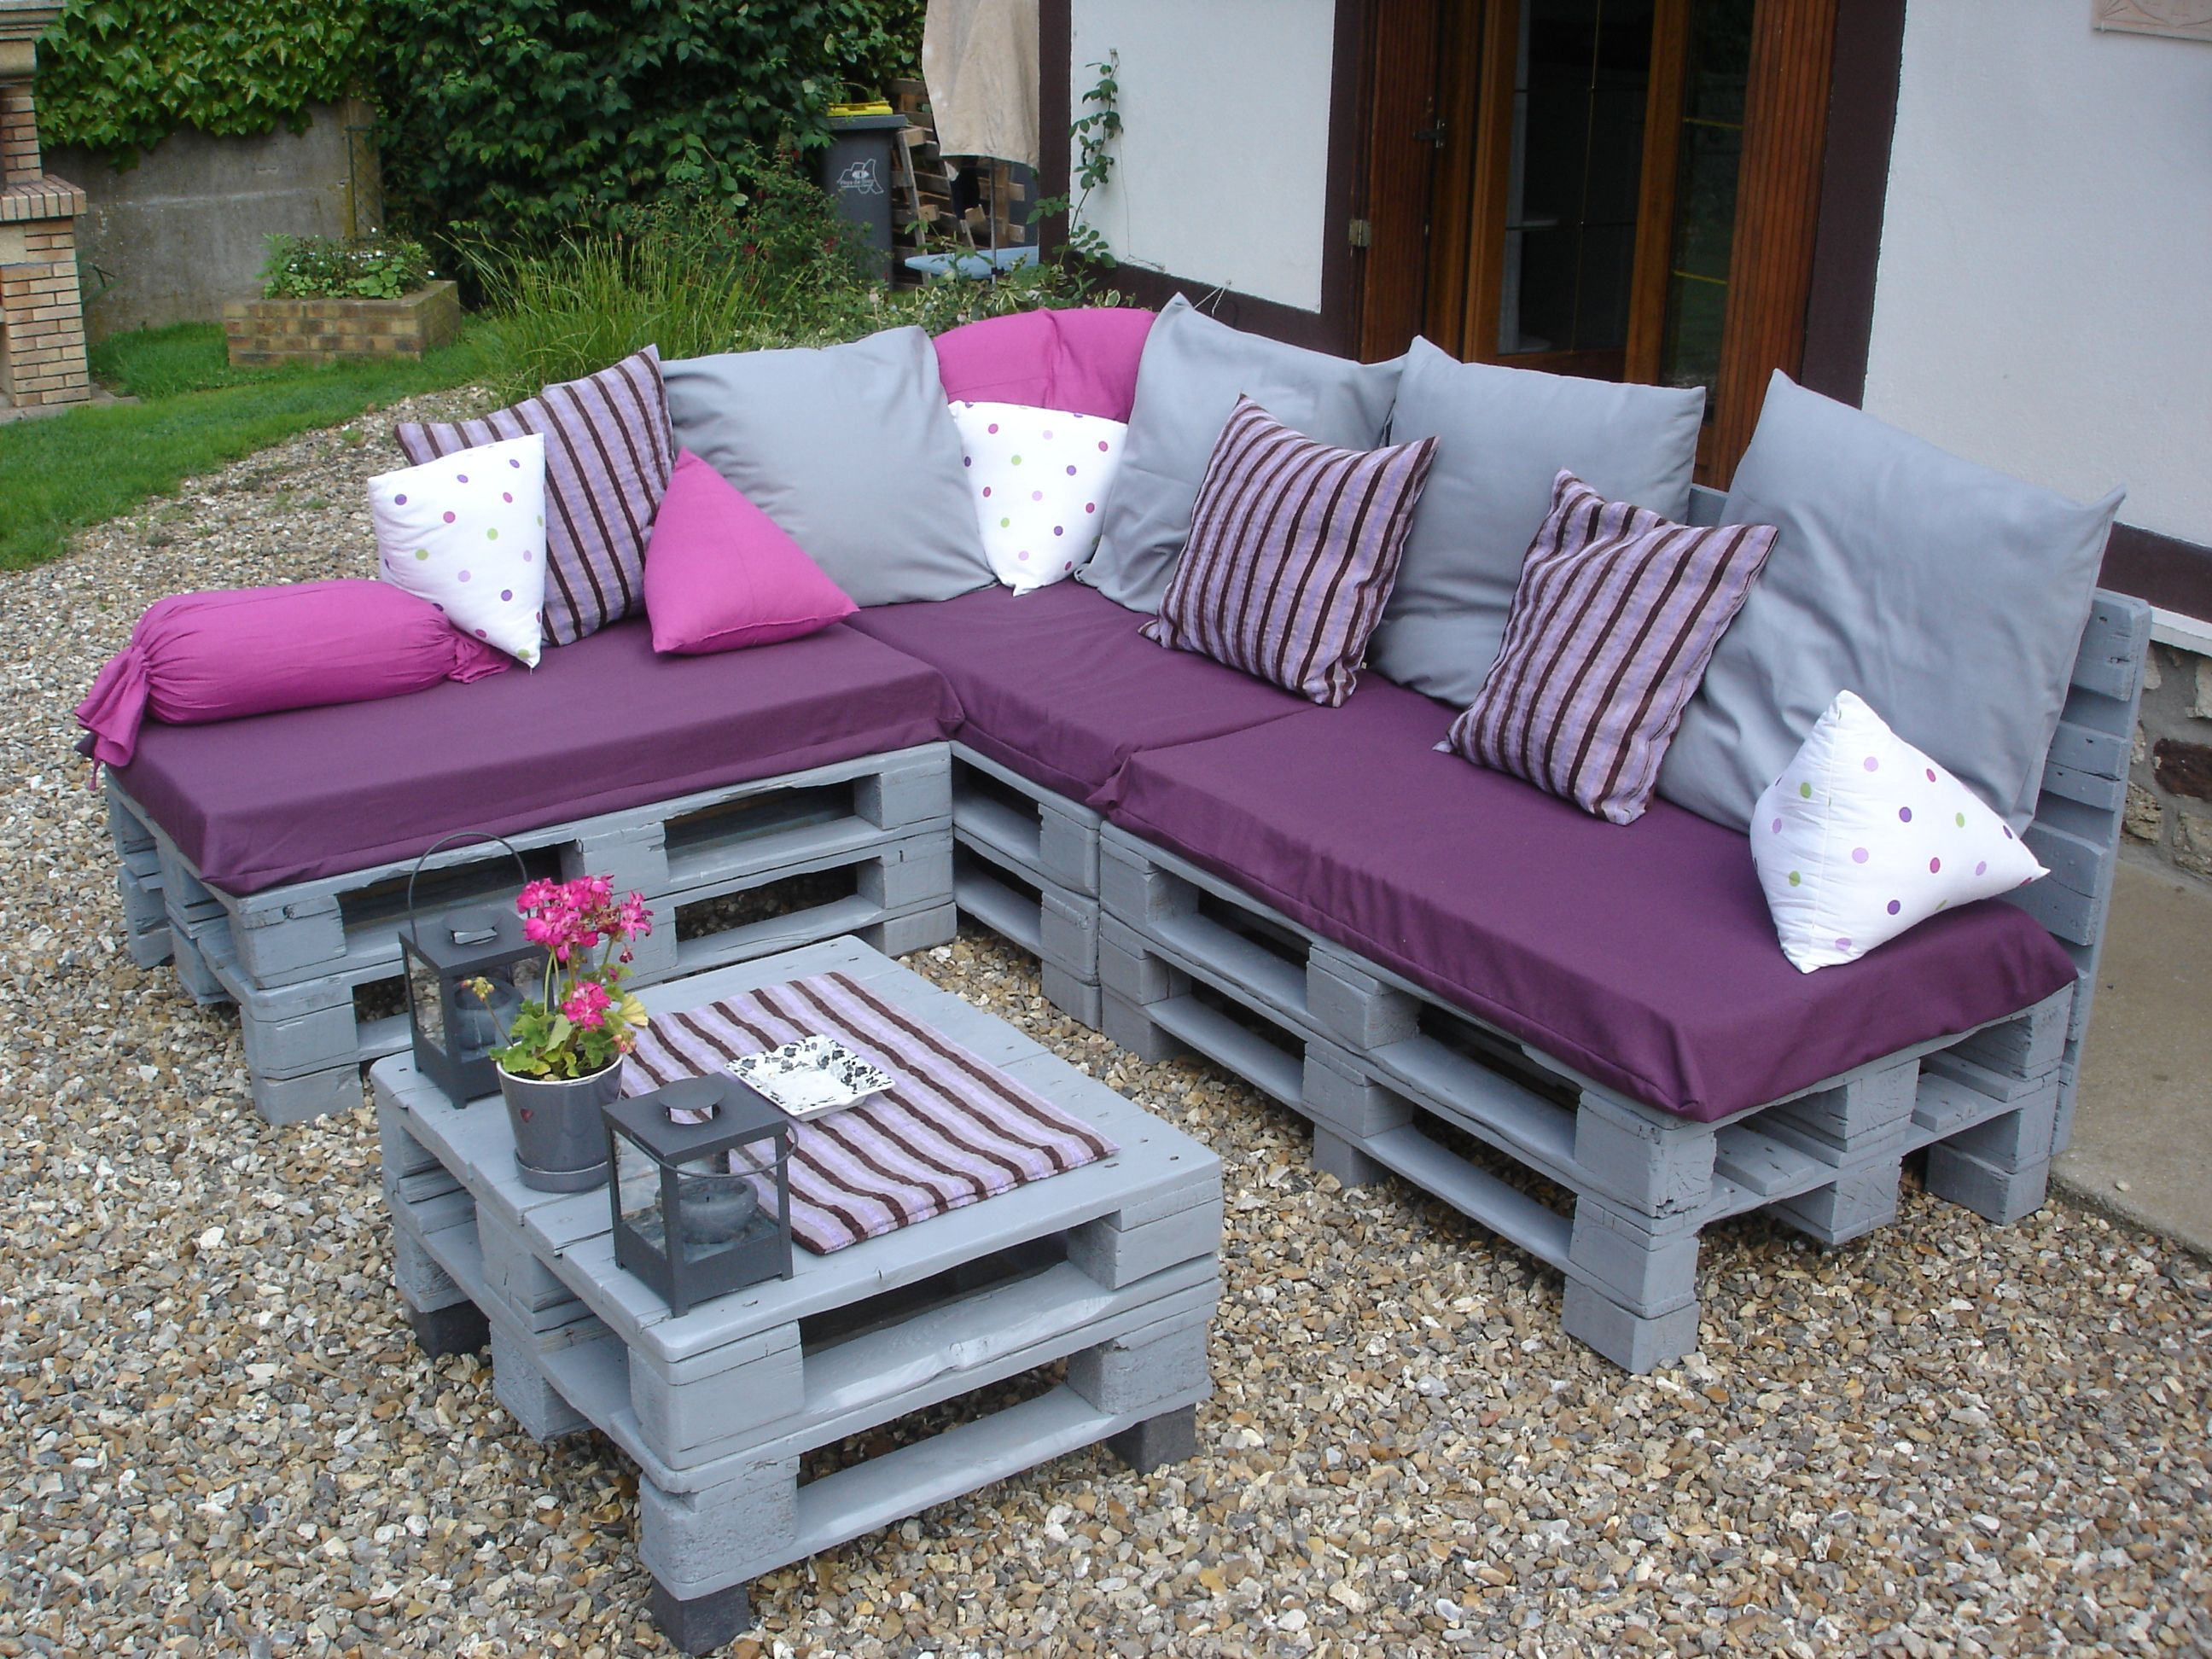 Pallets Garden Lounge / Salon De Jardin En Palettes Europe | Palette ...